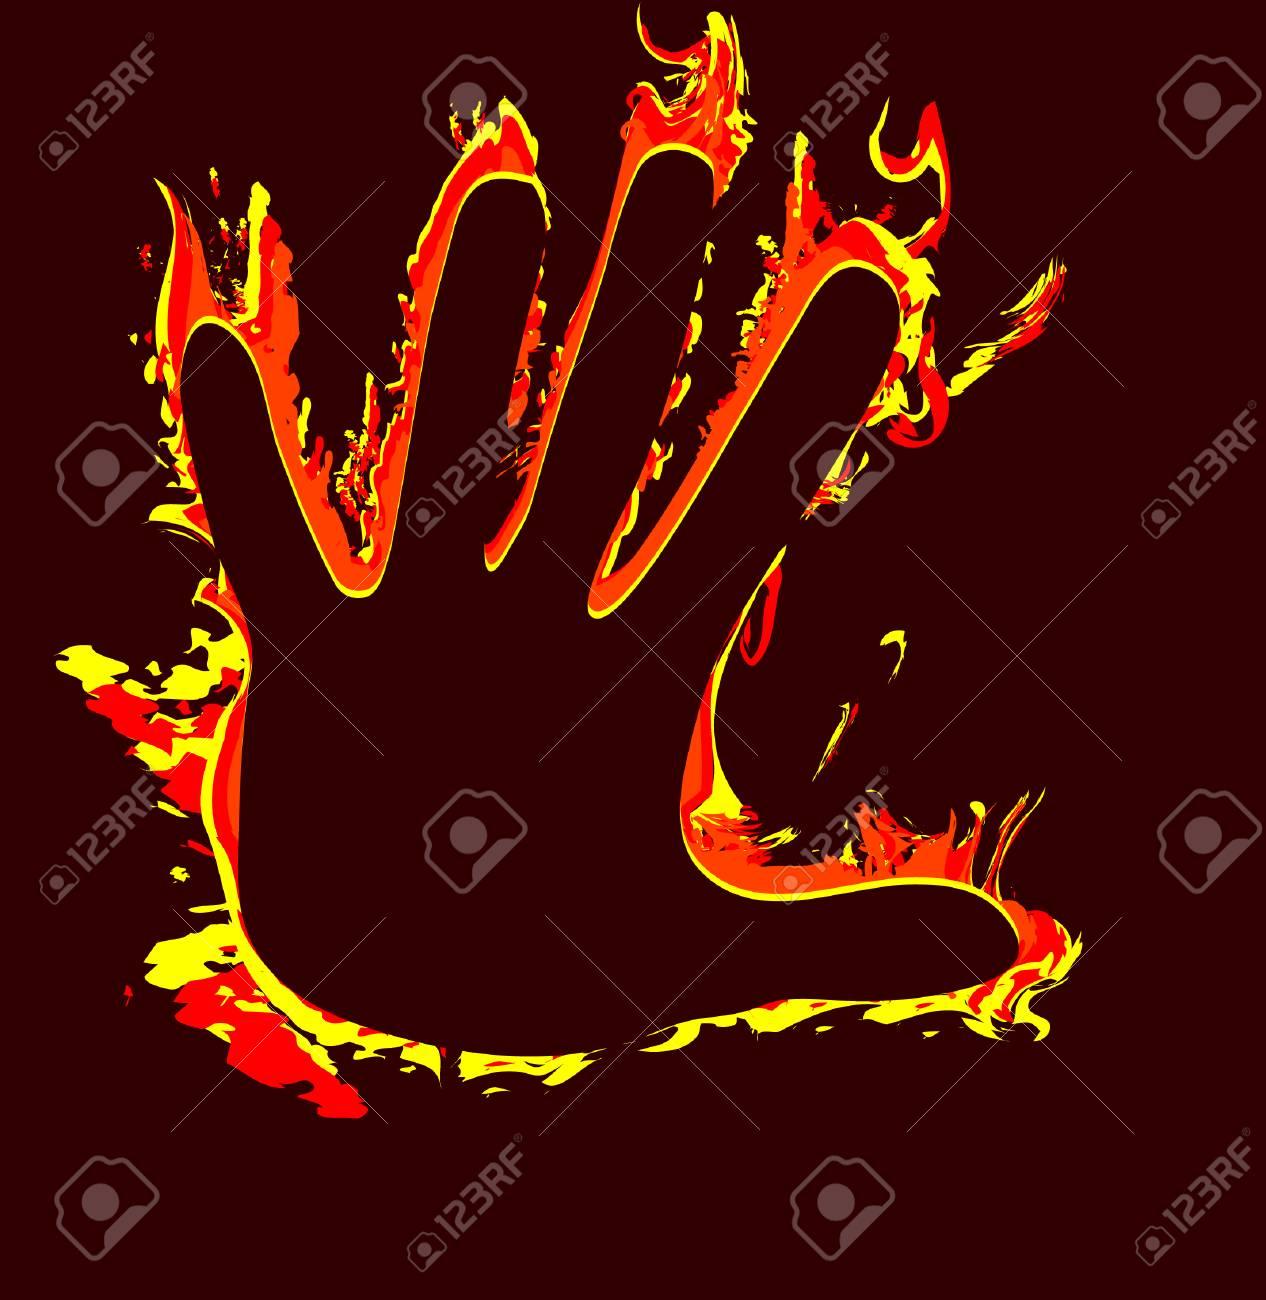 vector illustration - burned at work Stock Vector - 3679968